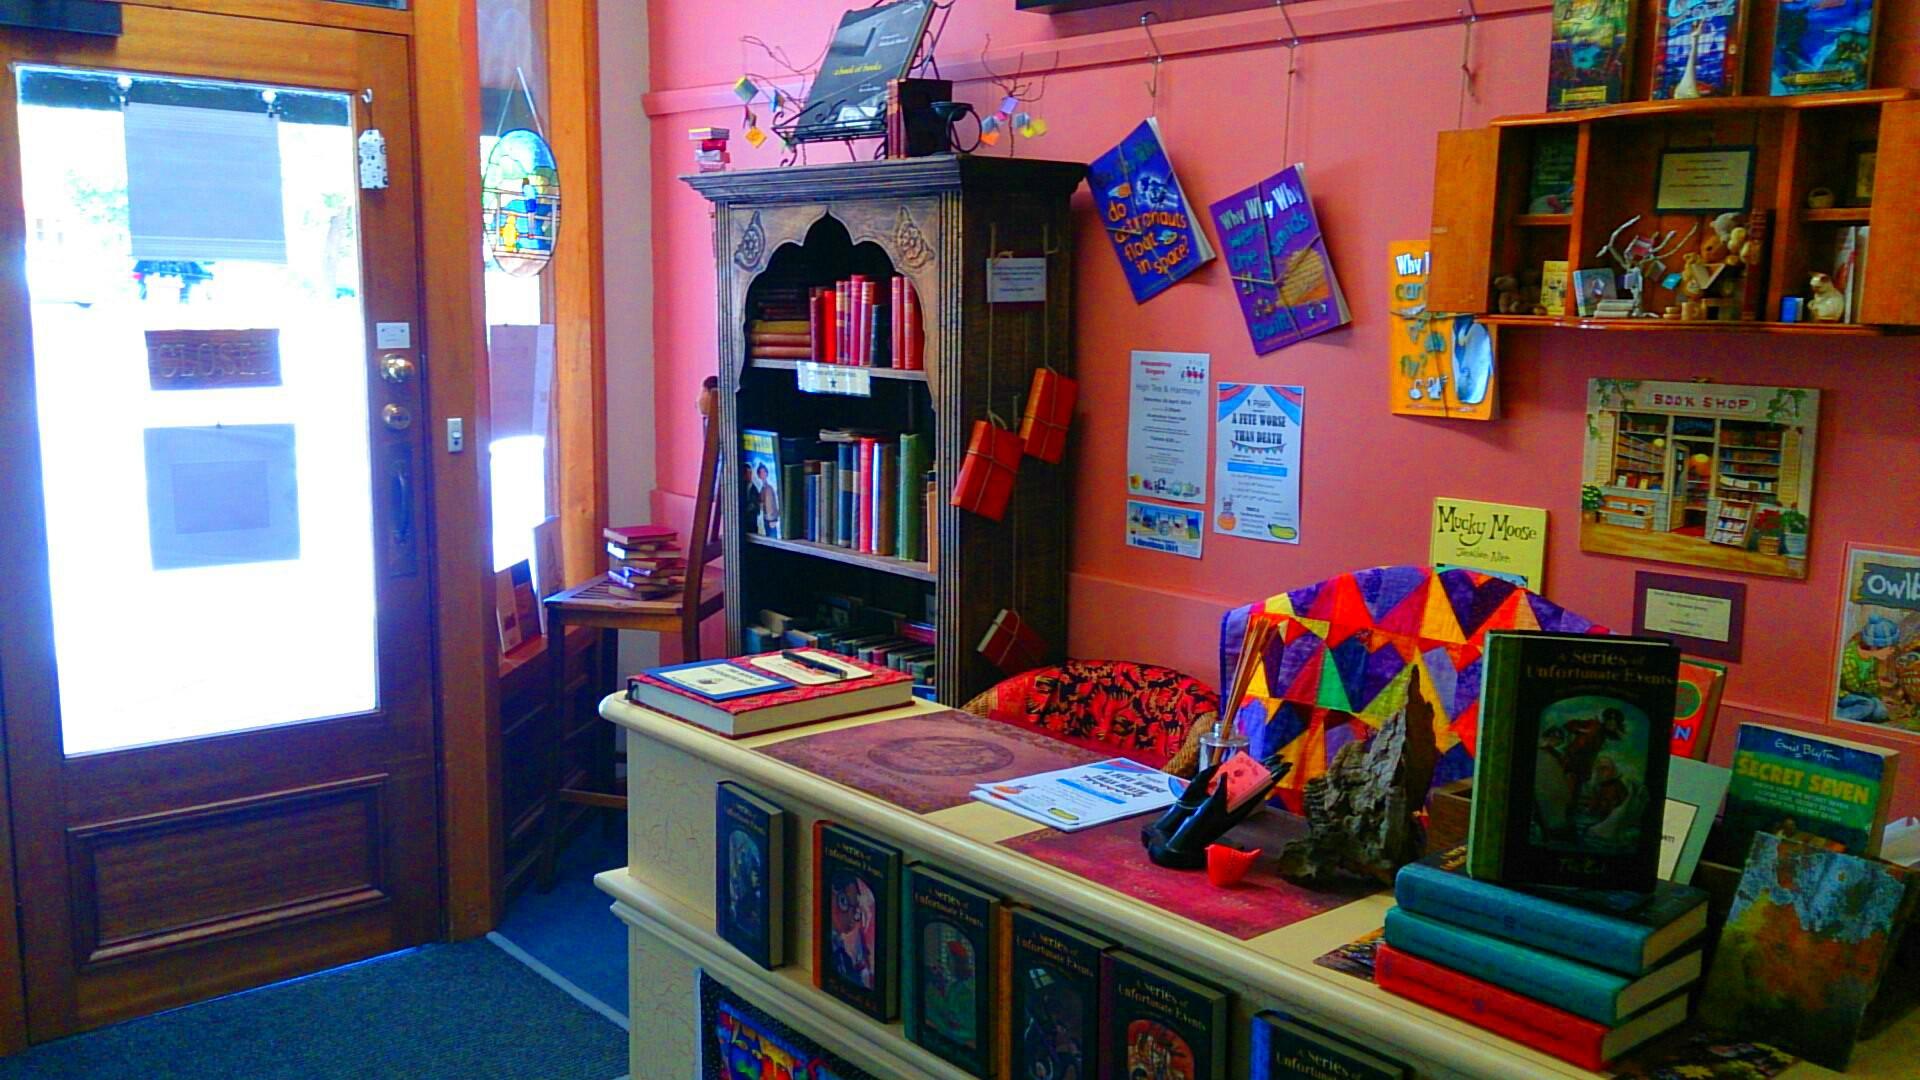 The Book Keeper Book Shop